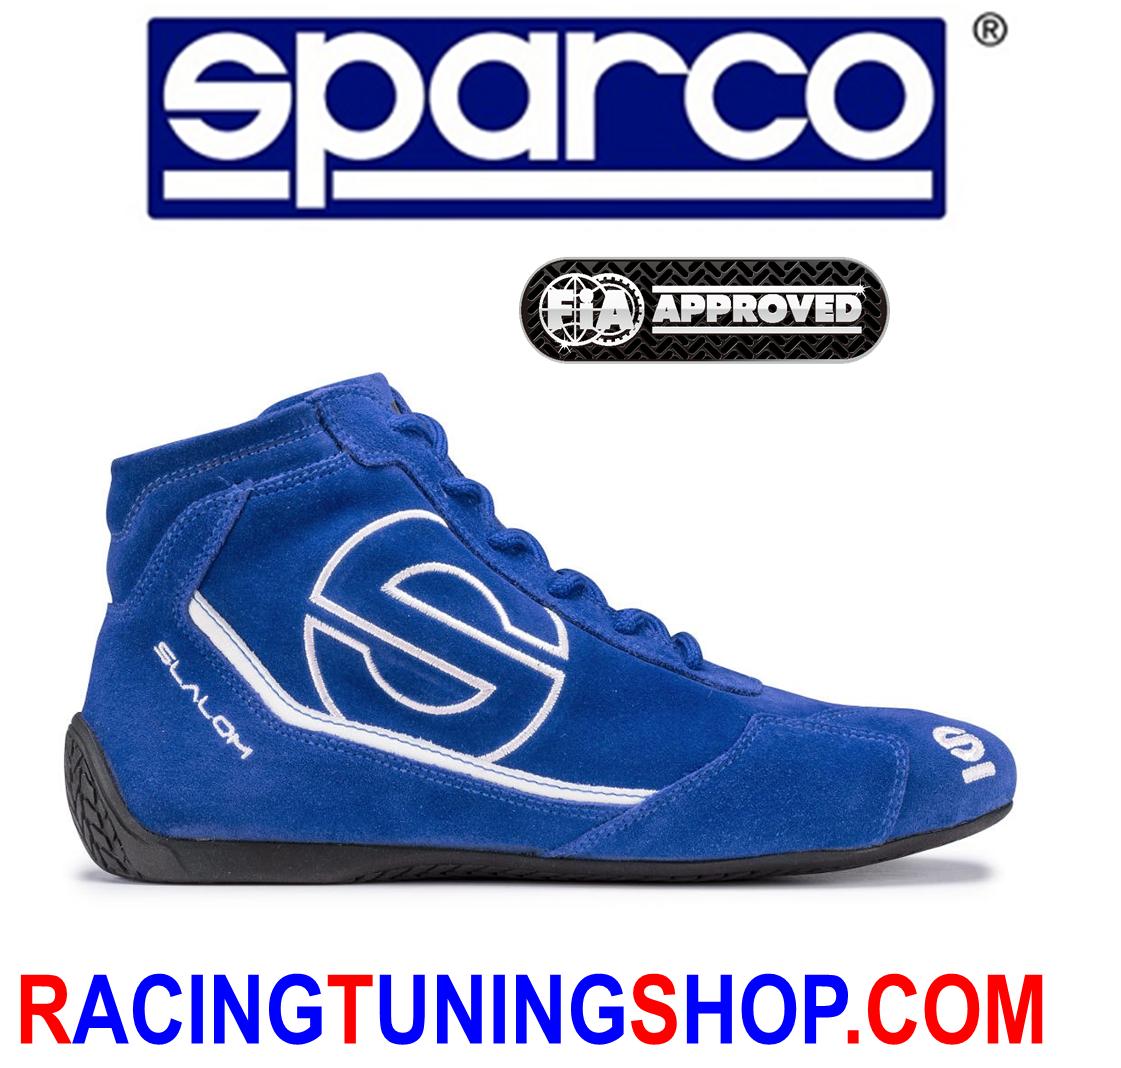 SCARPE SPARCO OMOLOGATE FIA SLALOM RB3 TG 40 BOOTS - RACING SHOES FIA BOOTS 40 EU 40 d1cfaa